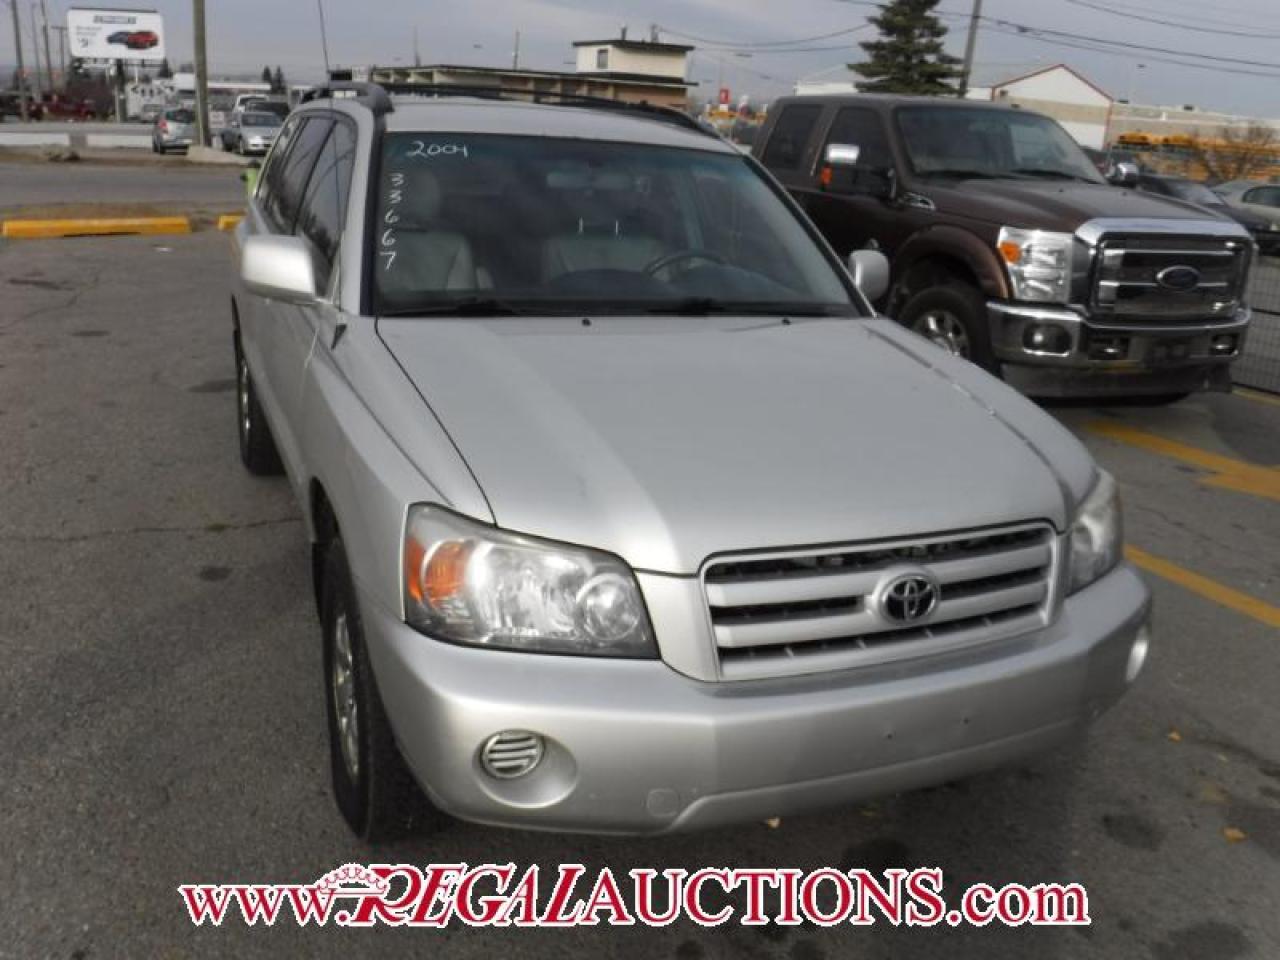 Photo of Silver 2004 Toyota Highlander